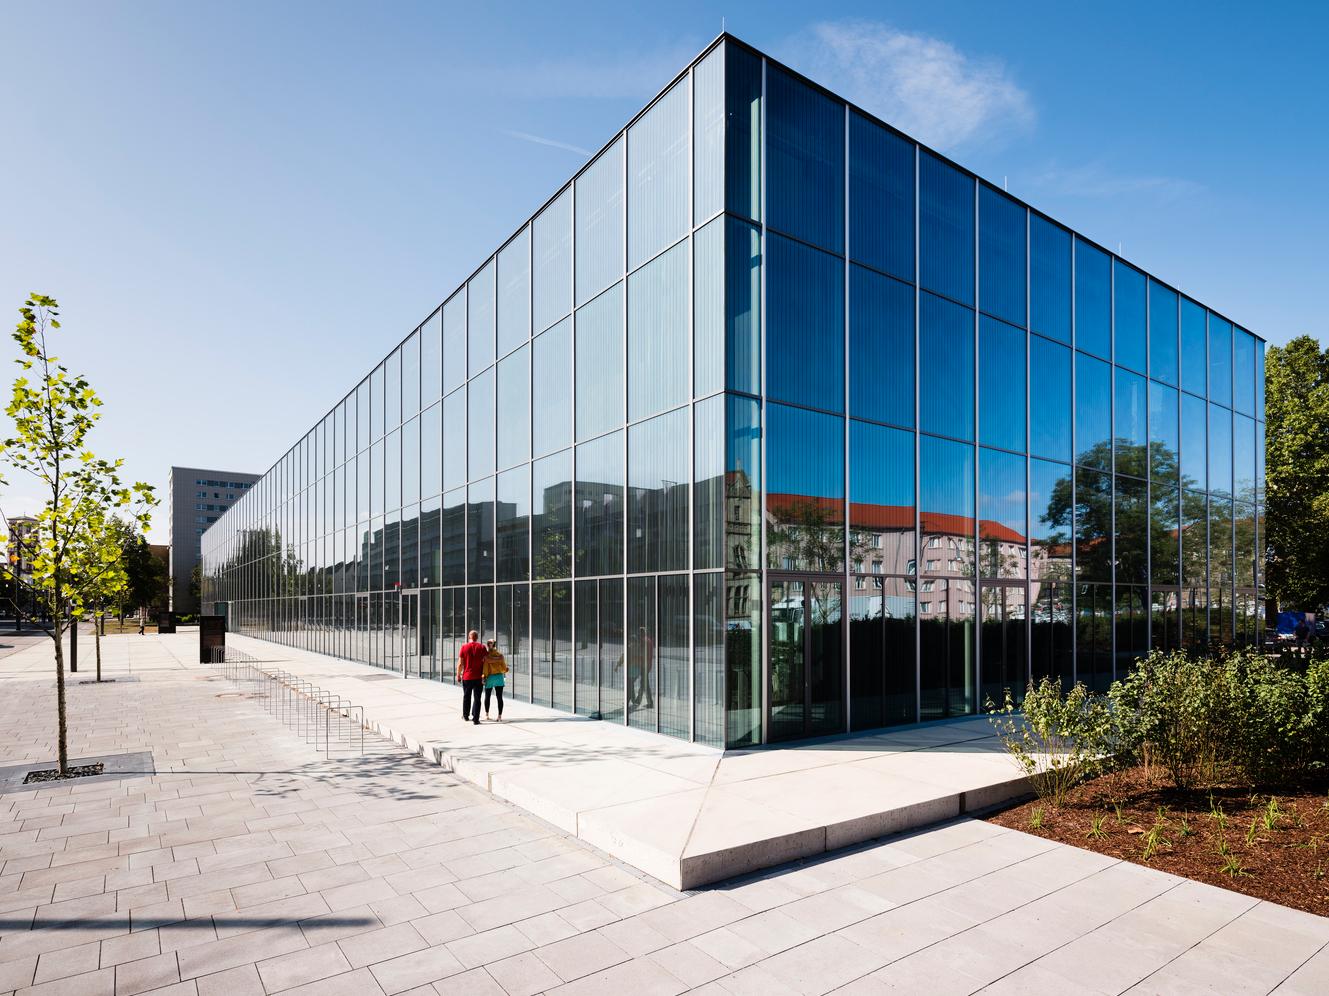 https://www.plataformaarquitectura.cl/cl/925644/museo-bauhaus-dessau-addenda-architects/5d8faf75284dd19b1700046c-museo-bauhaus-dessau-addenda-architects-foto